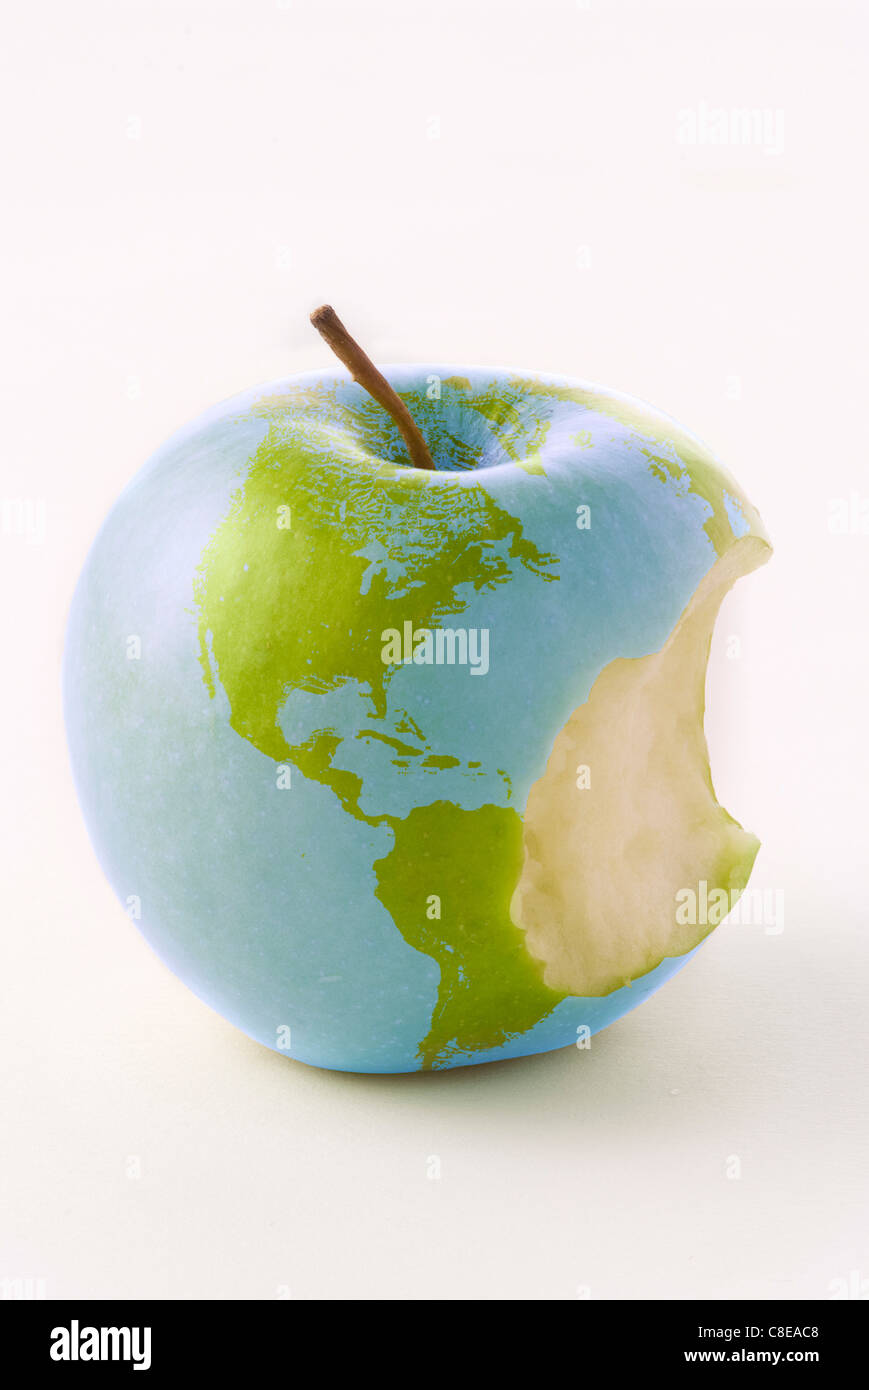 Globe on a mordu apple Photo Stock